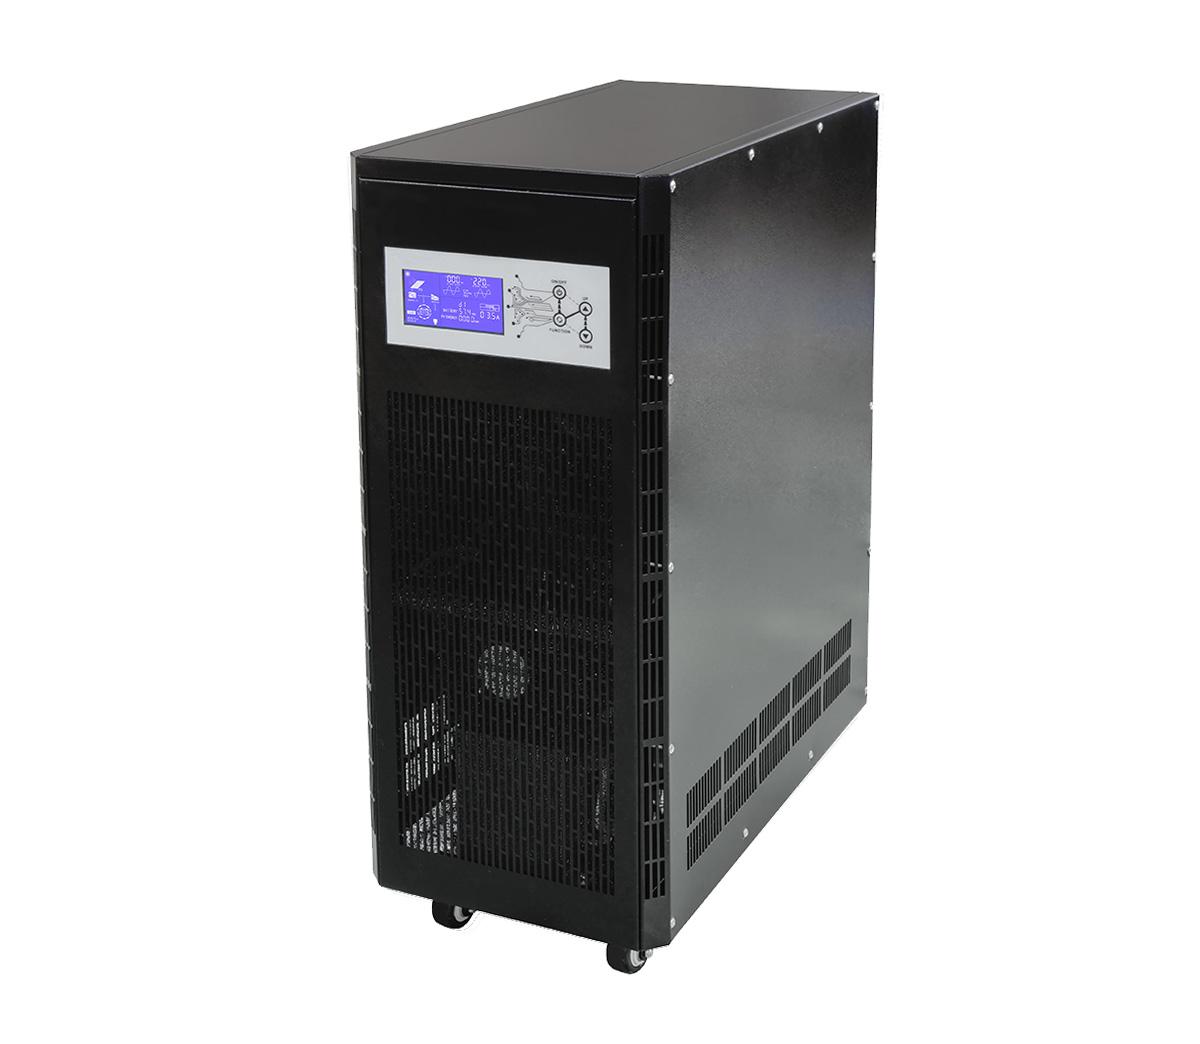 3 phase hybrid inverter 4kva-8kva